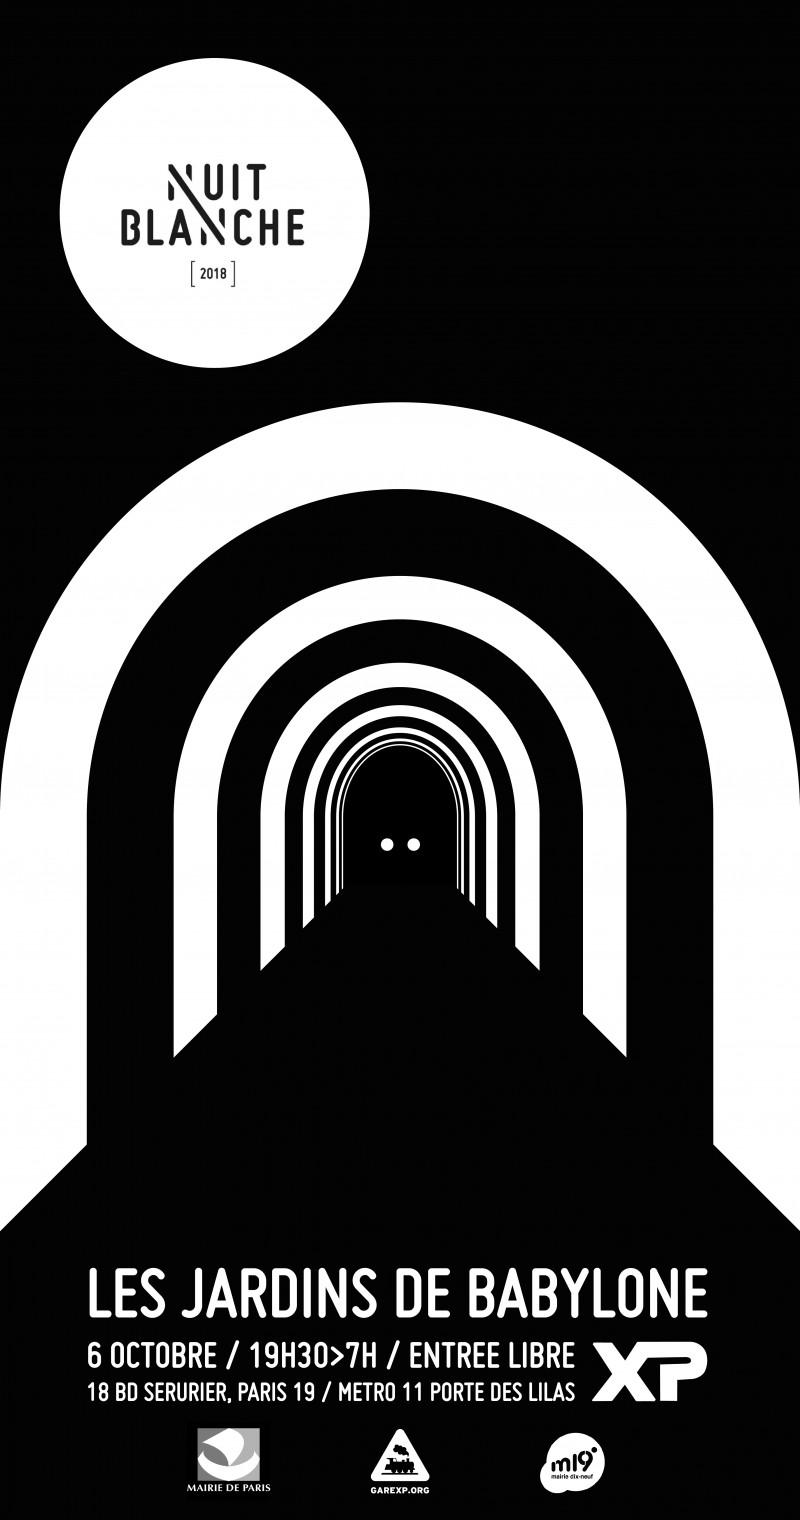 affiche-nuit-blanche-2018-gare-xp-b9971ed746c8e2fa3505f52e9010c3d6